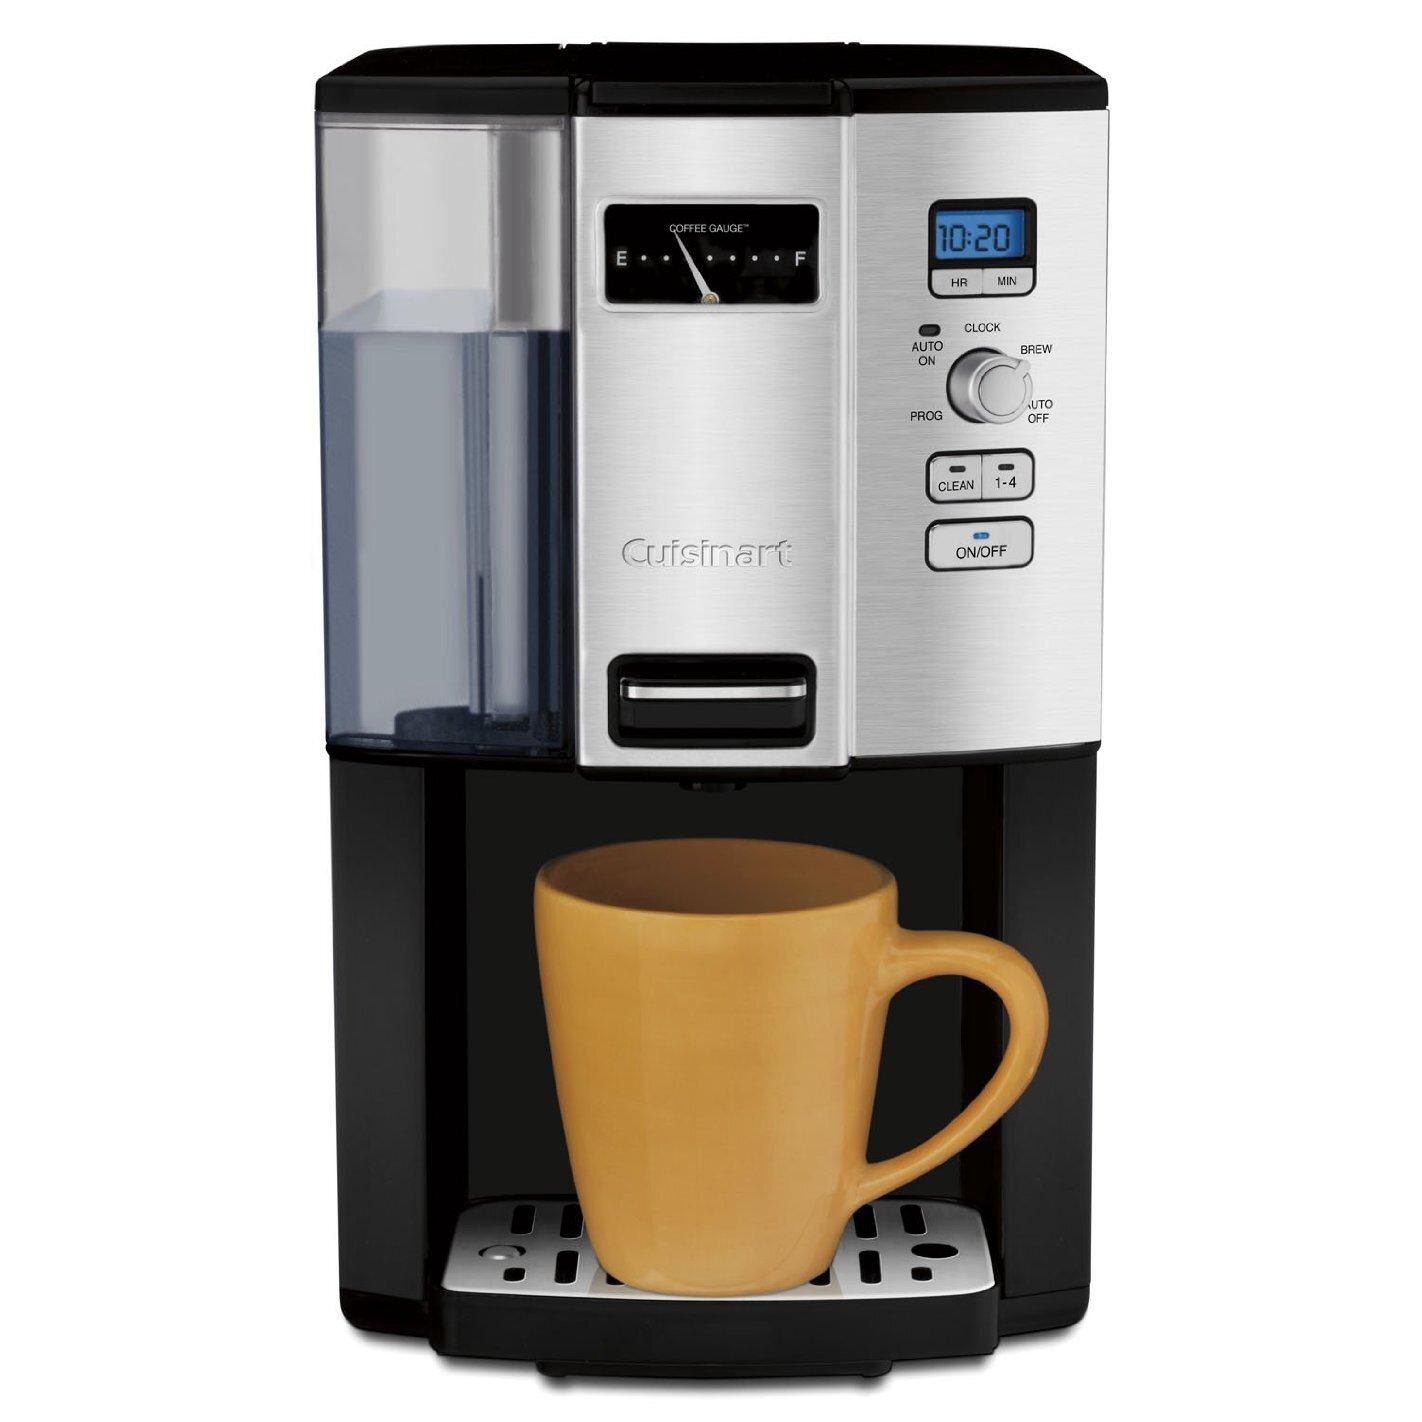 Espresso Coffee Maker Ratings : Cuisinart Cuisinart 12 Cup Programmable Coffee Maker & Reviews Wayfair